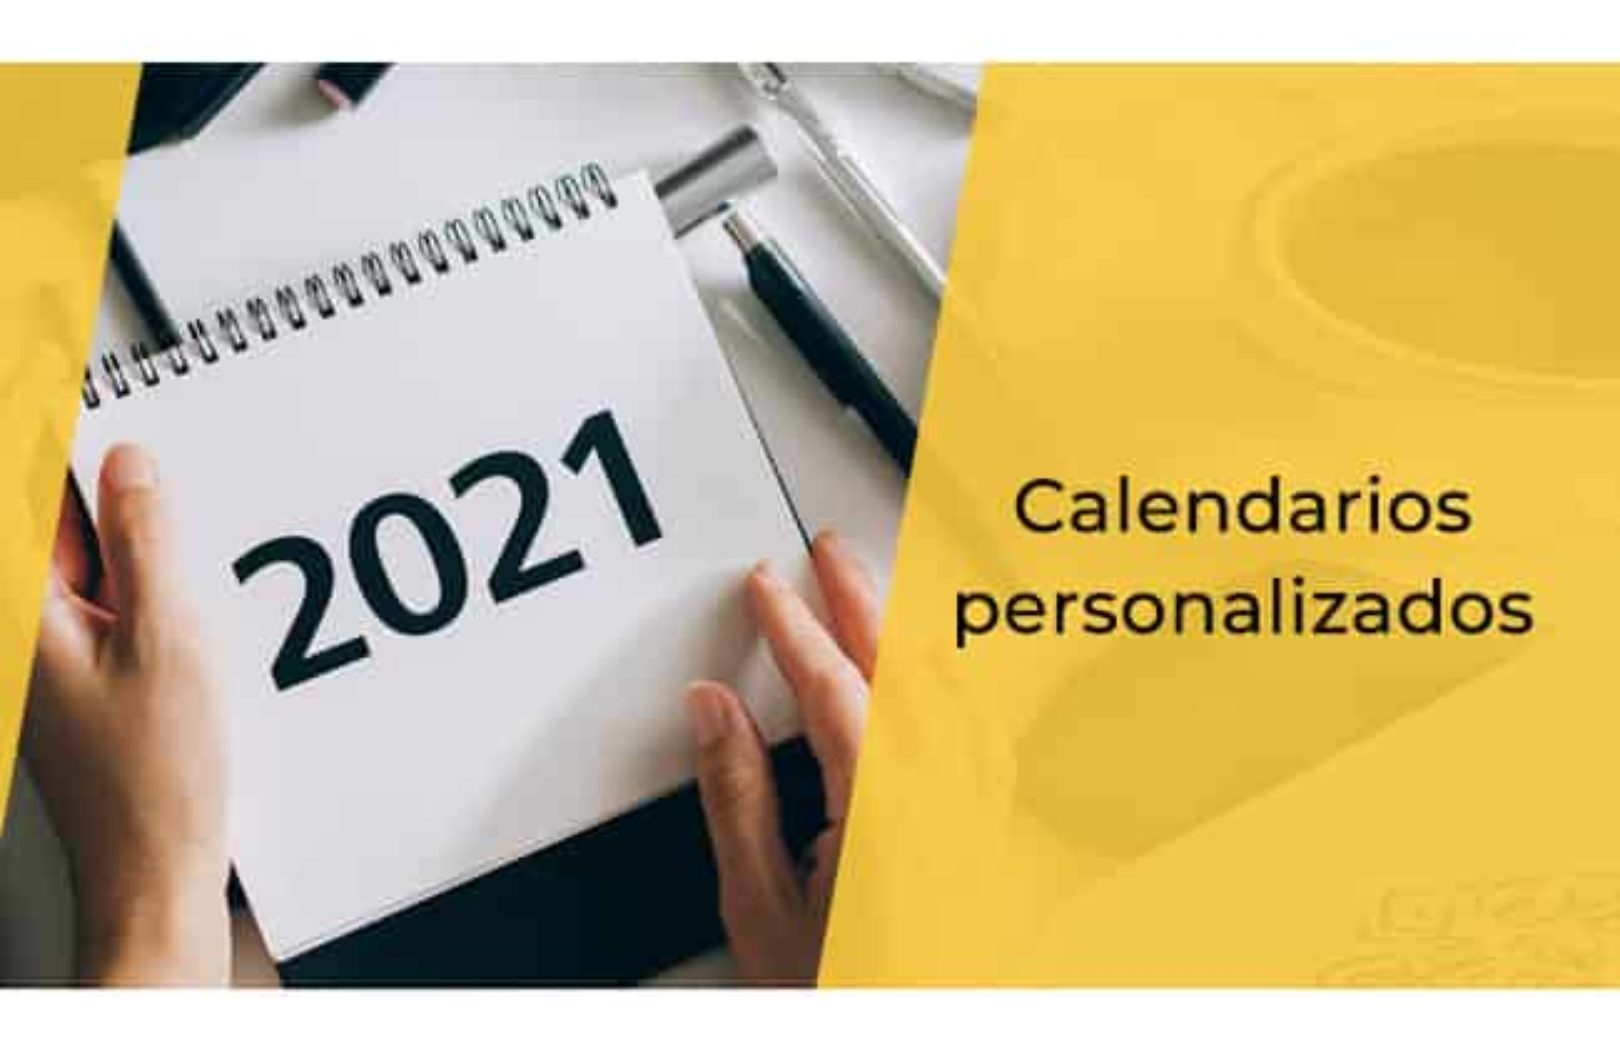 calendarios-personalizados-min